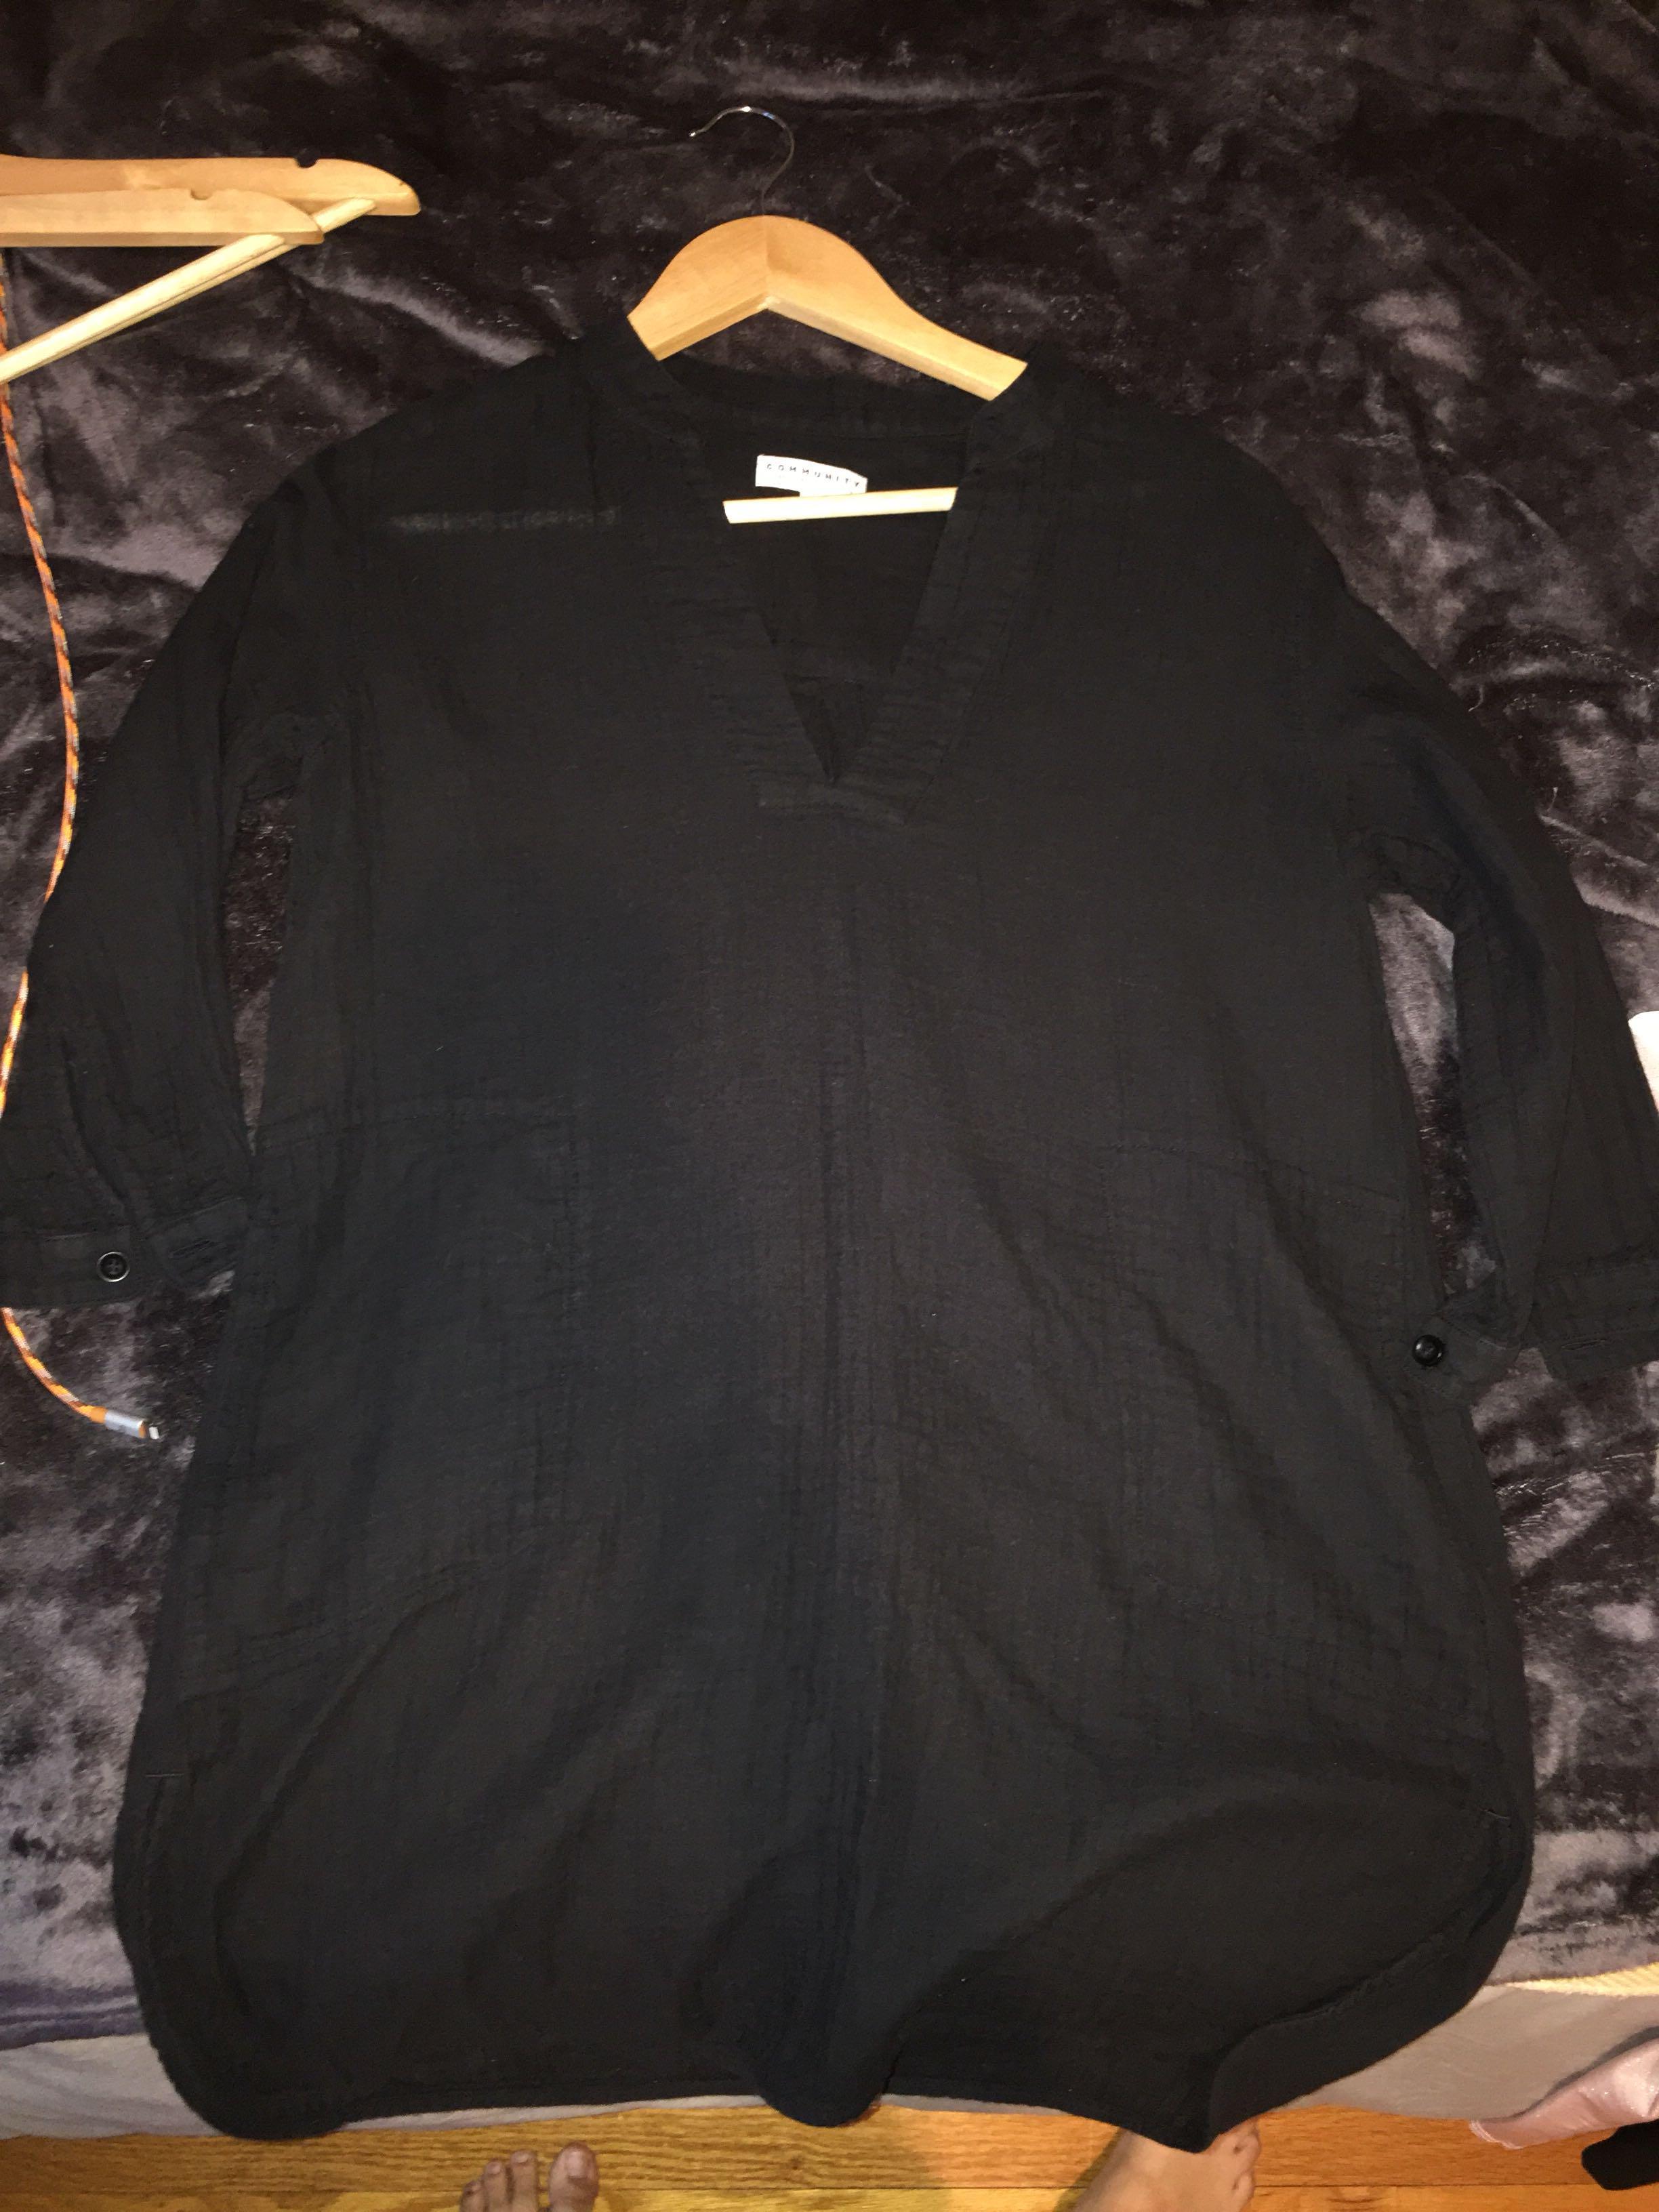 Artizia community dress